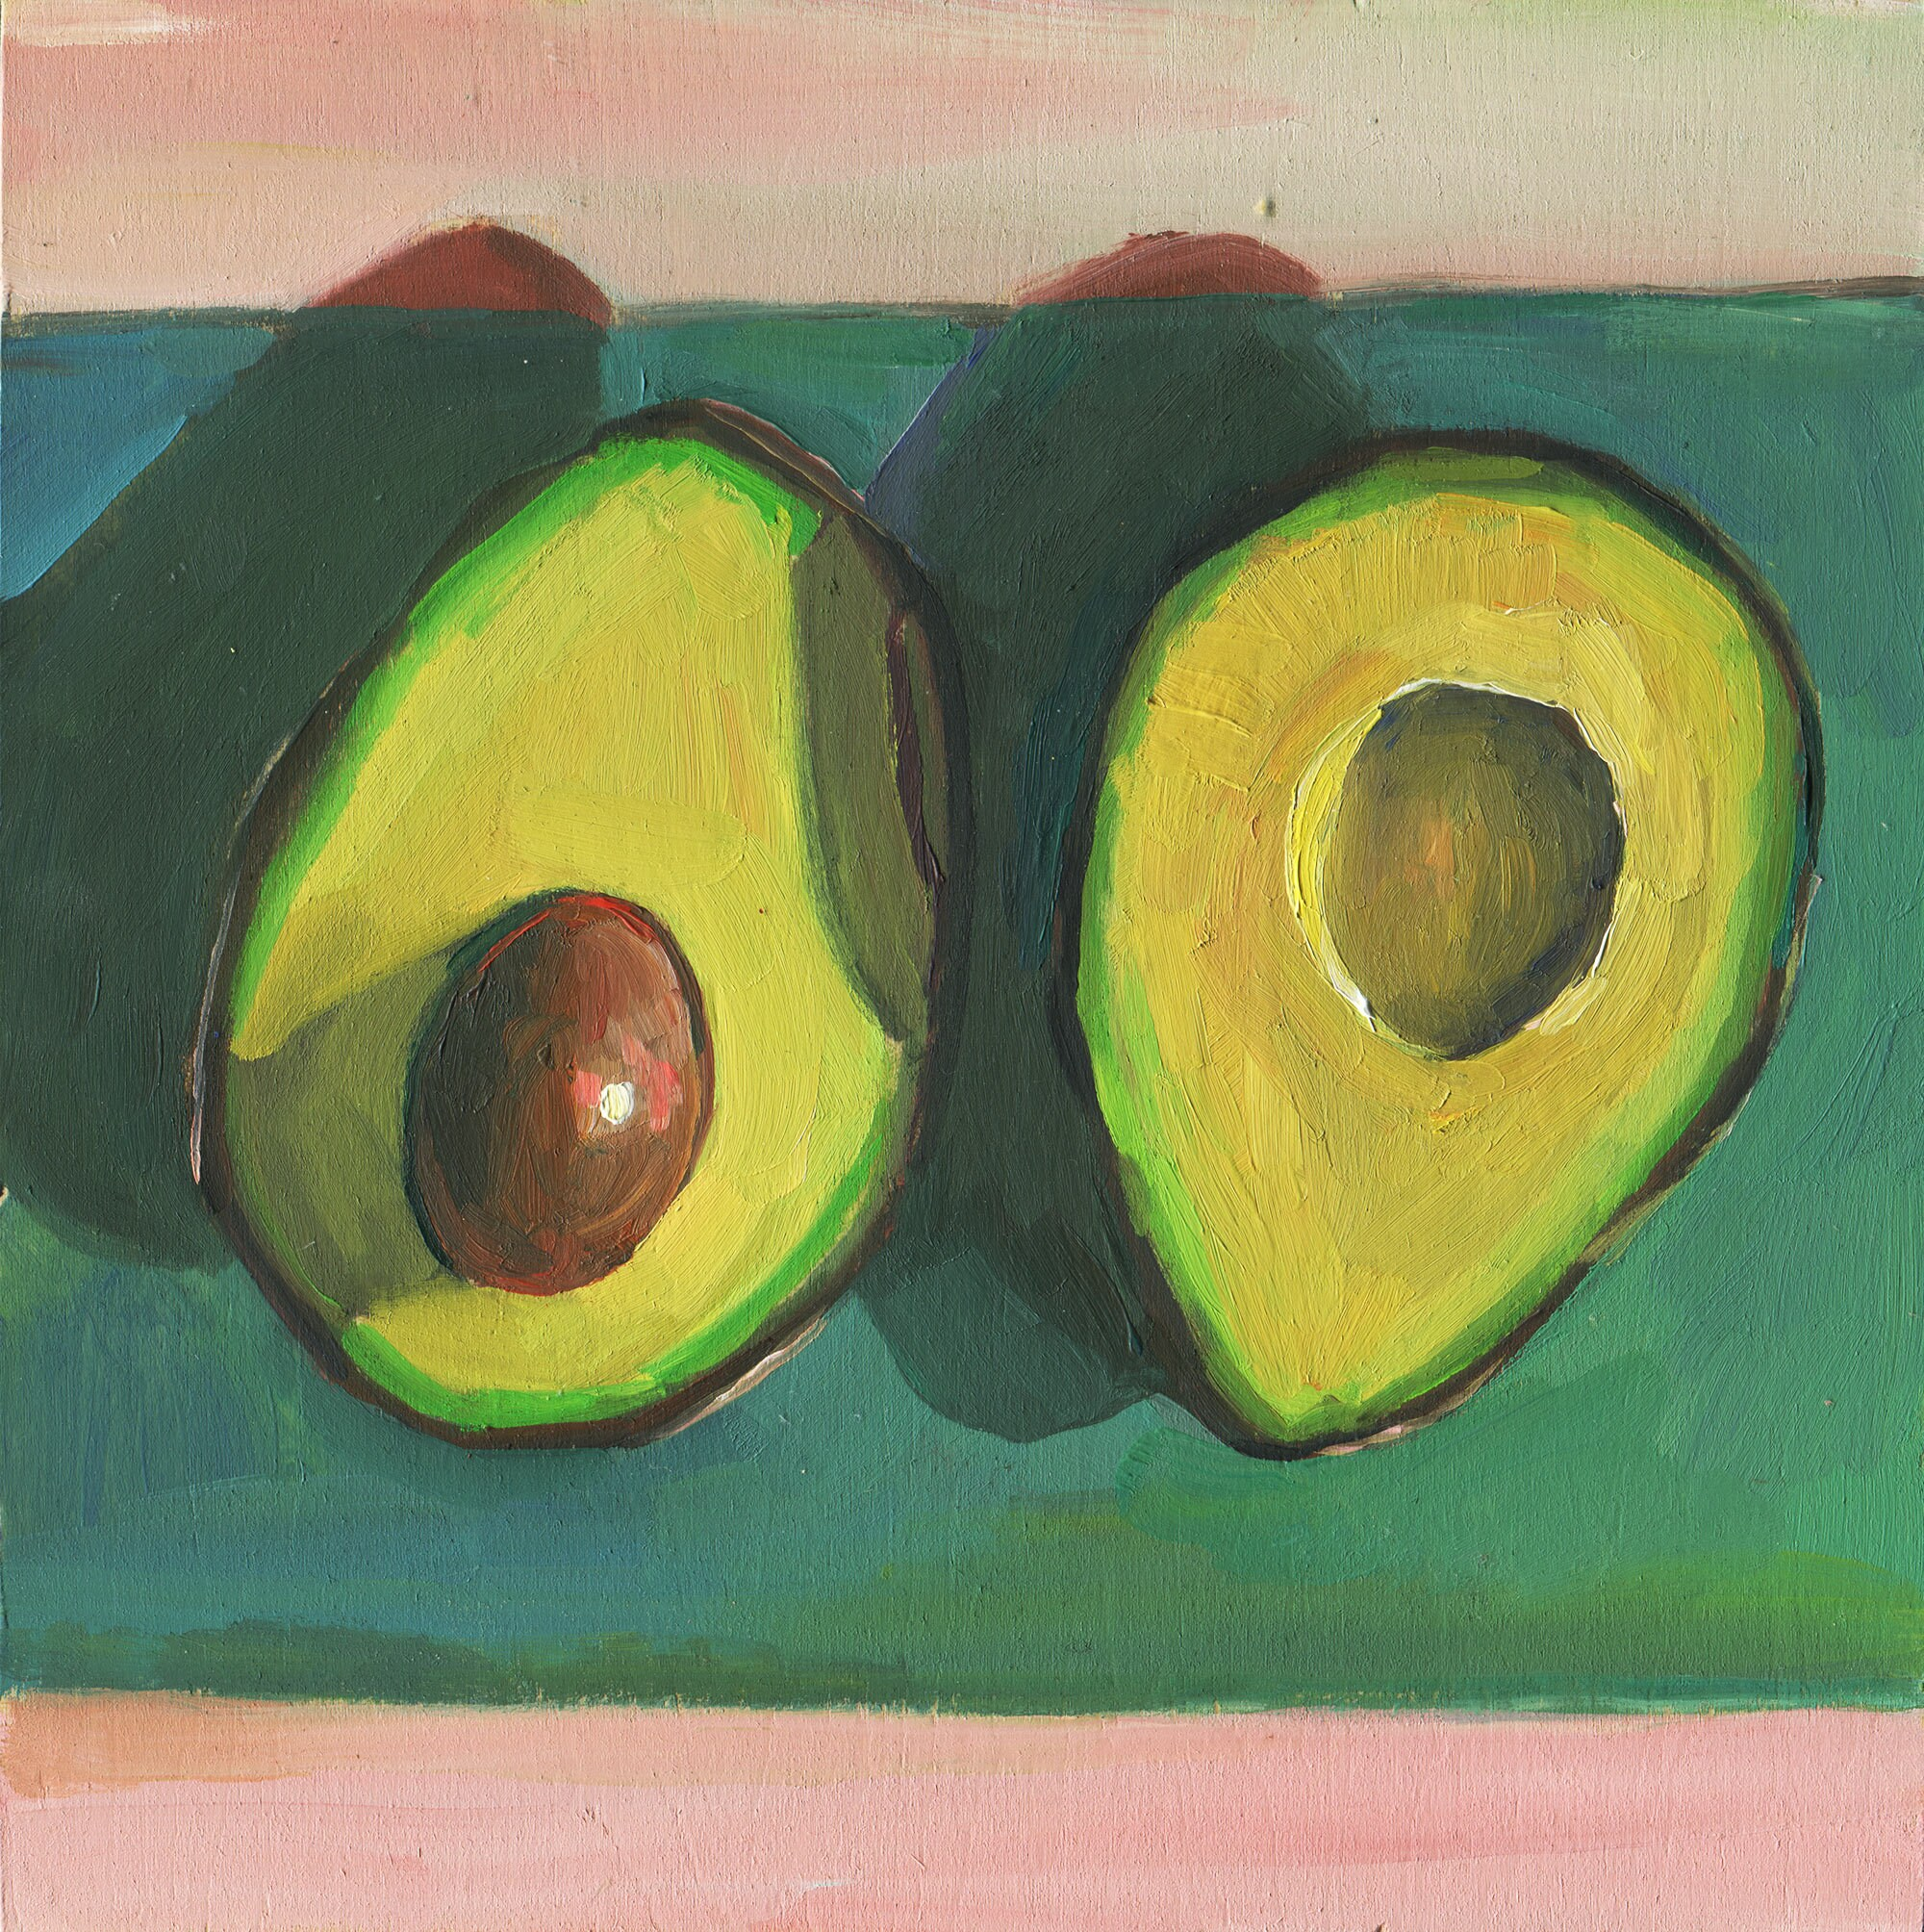 Avocado Original Oil Painting Avocado Wall Decor Fruit Food | Etsy